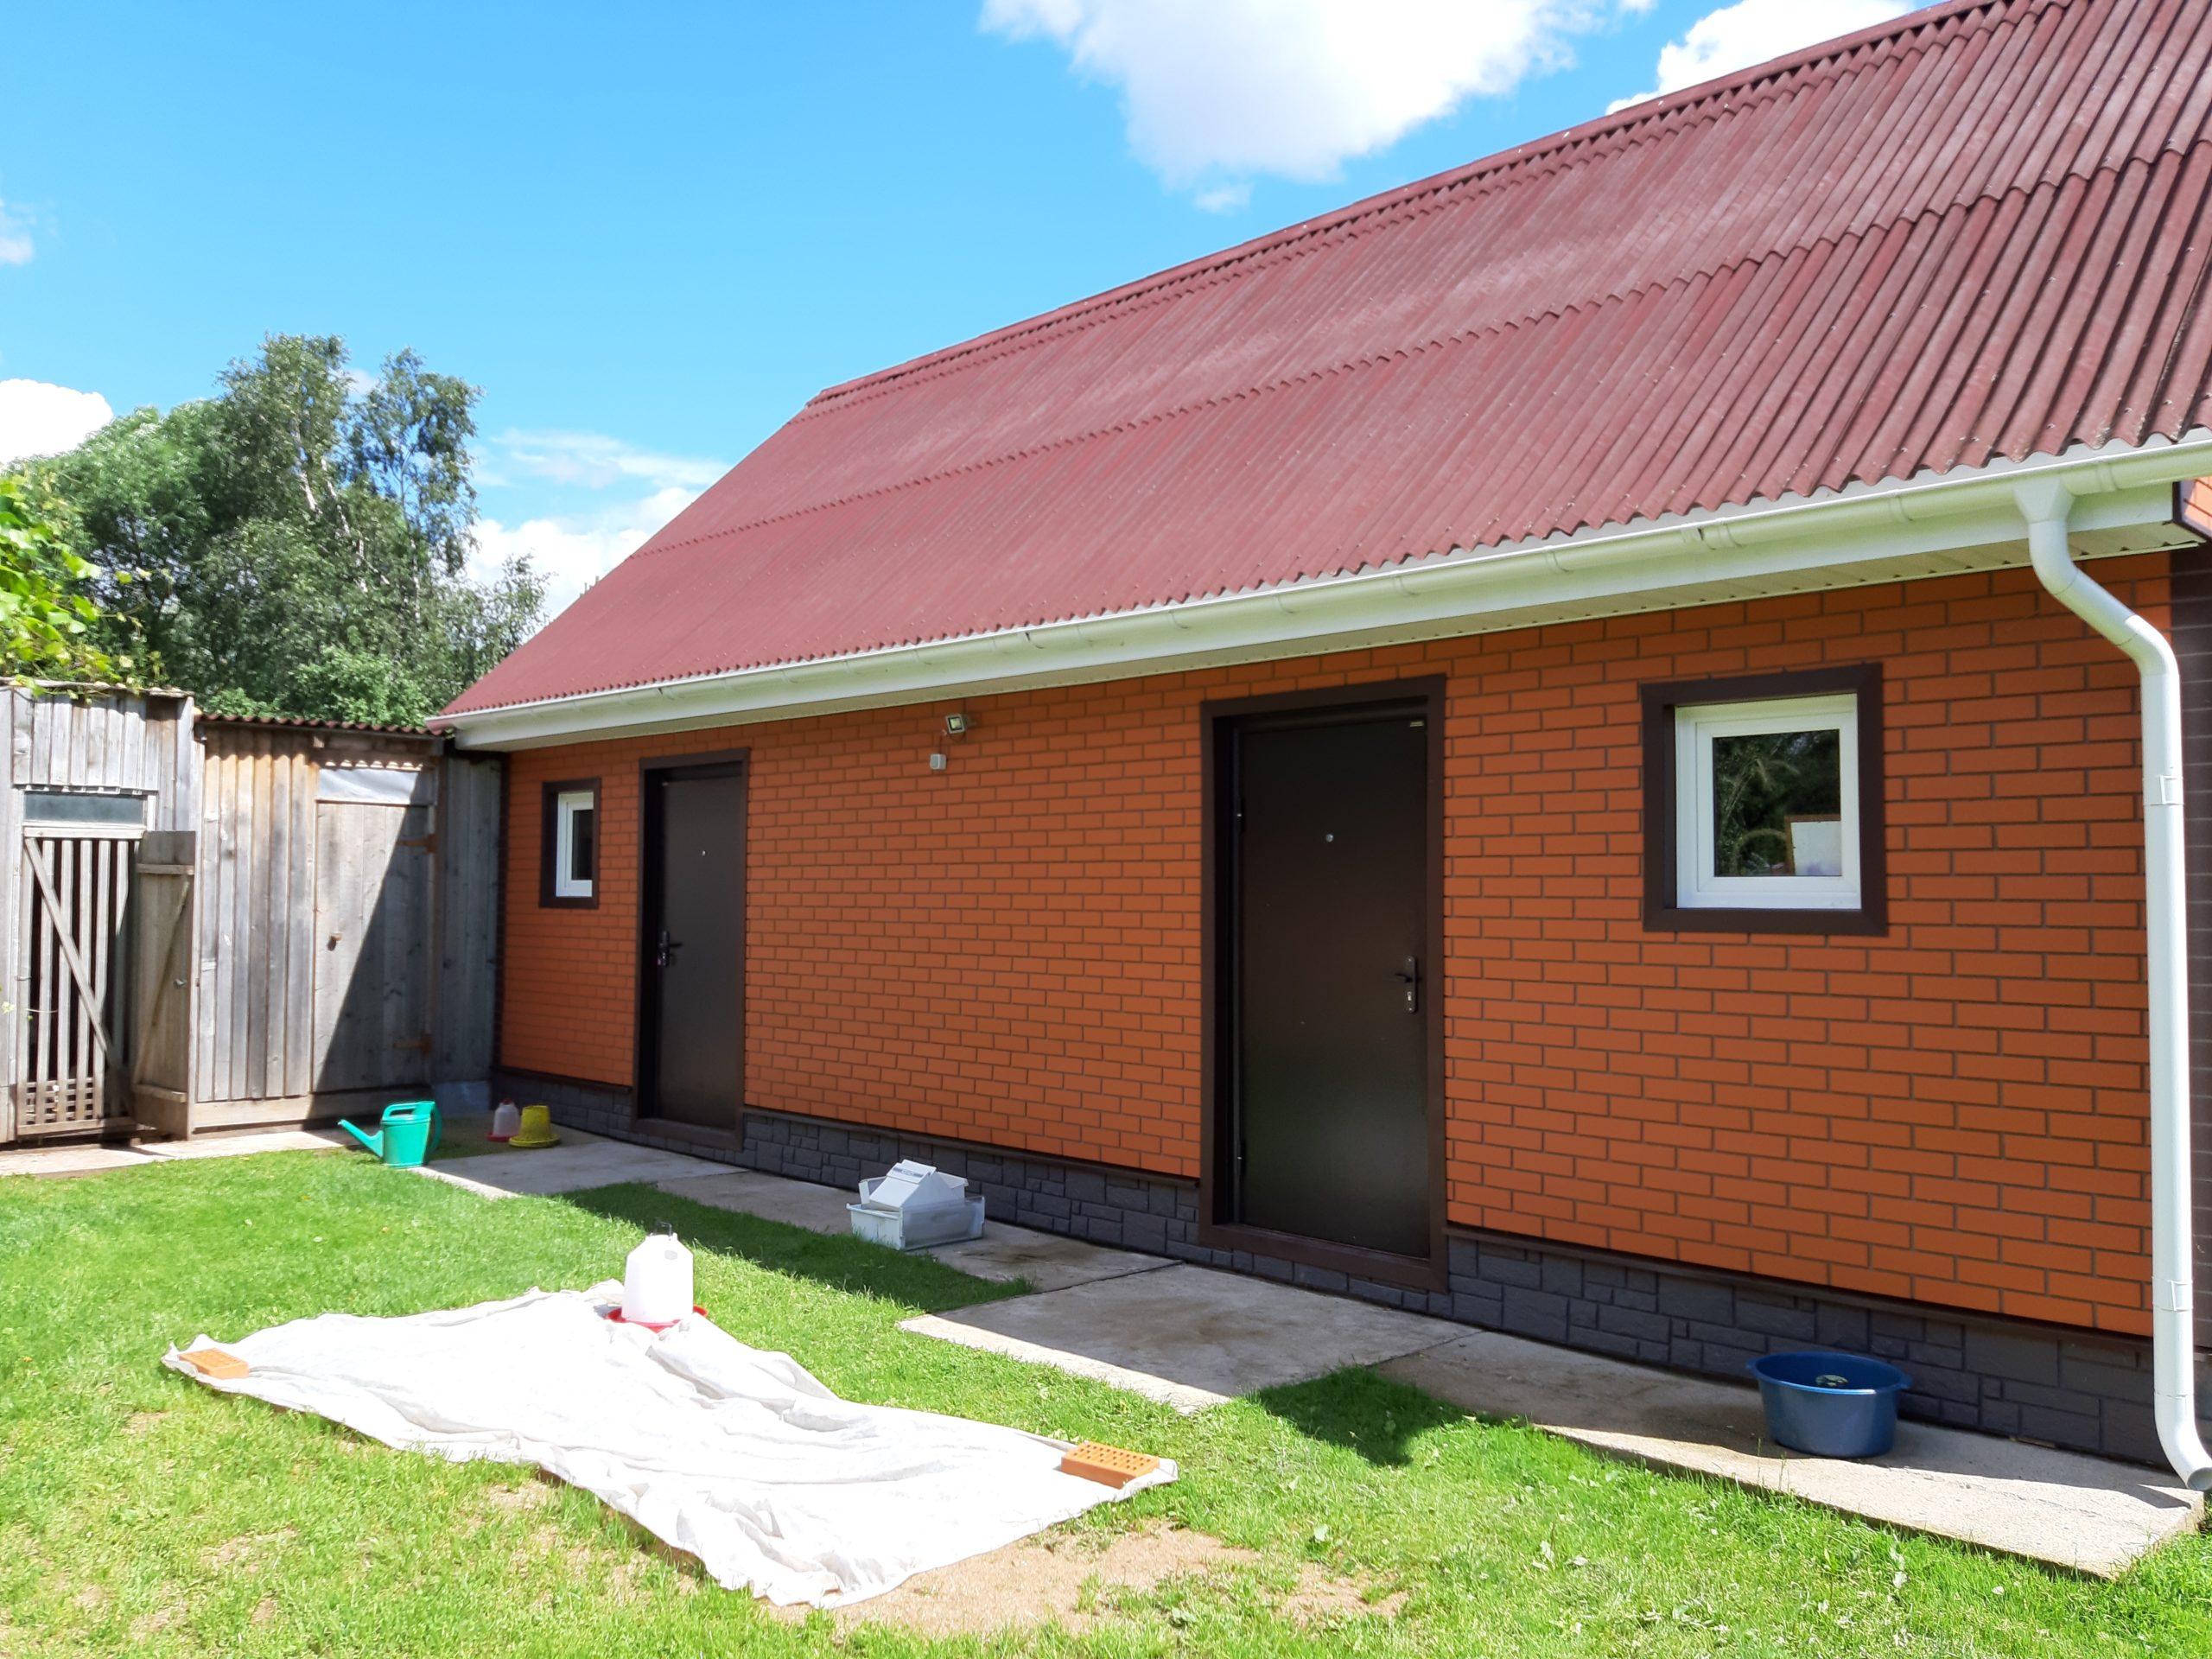 Фасадные панели BrickPanel на доме